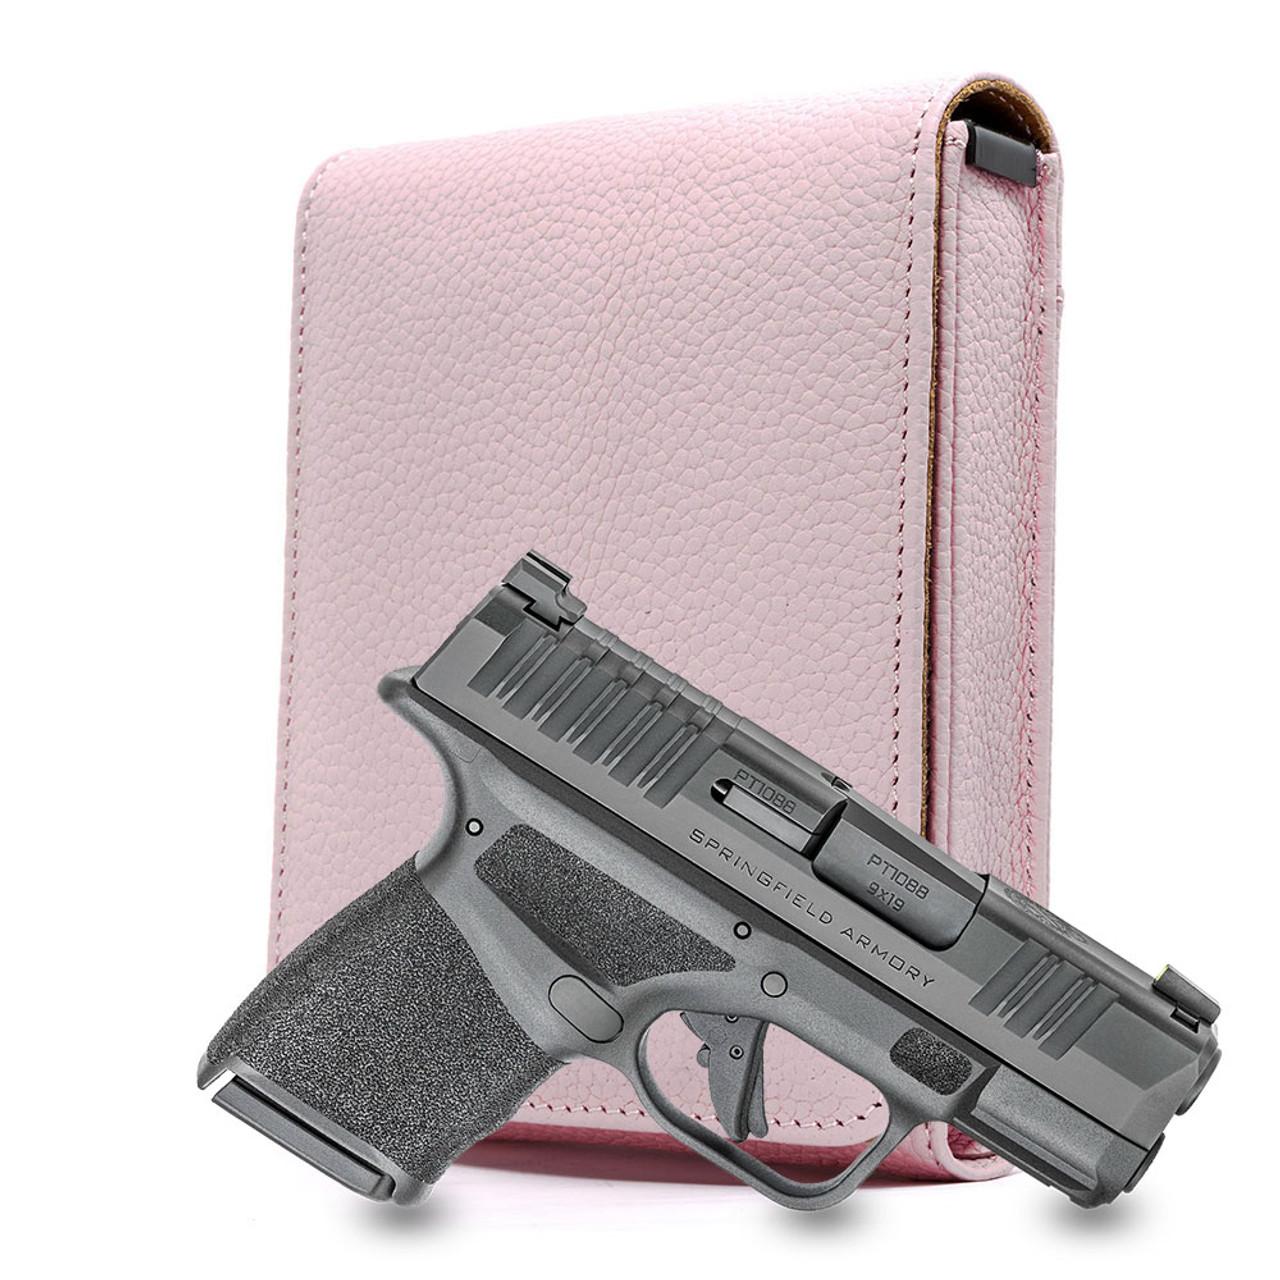 Springfield Hellcat Pink Carry Faithfully Cross Holster